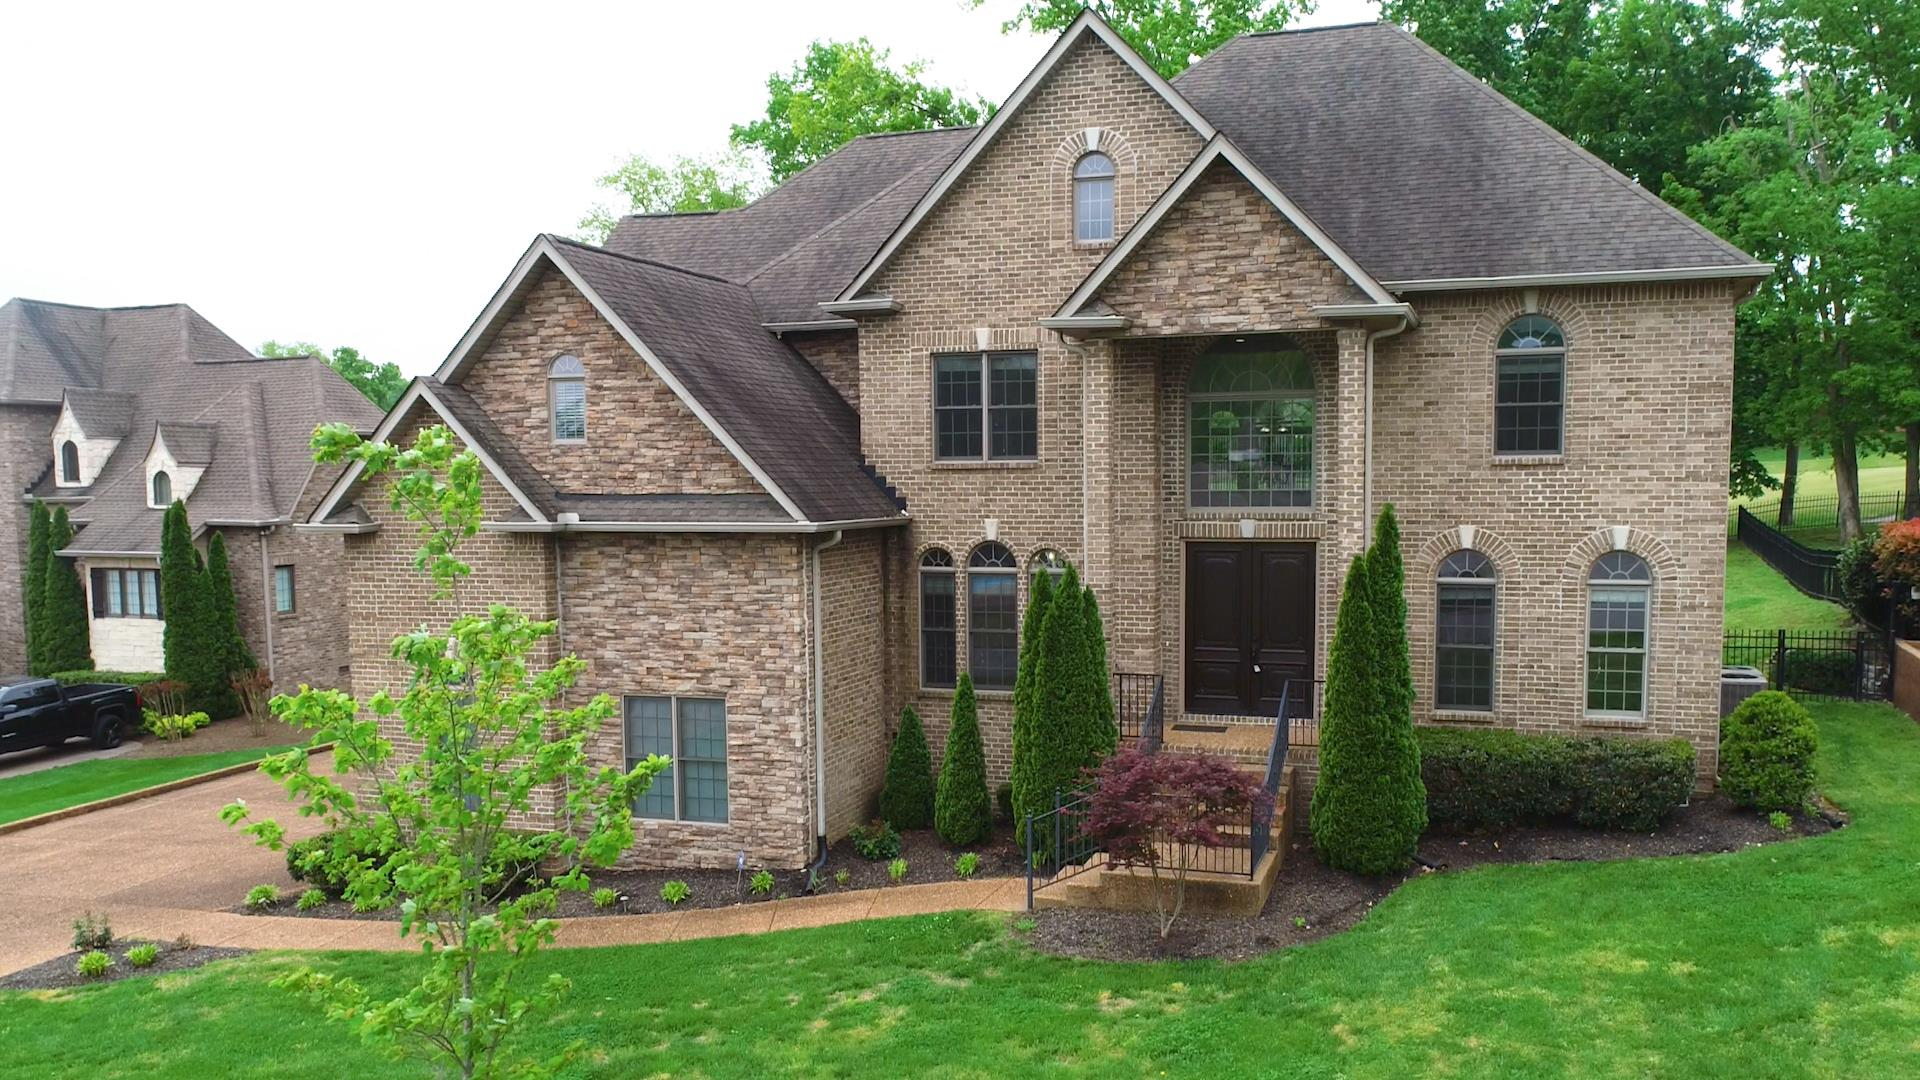 625 Ridgecrest Ln, Lebanon, TN 37087 - Lebanon, TN real estate listing